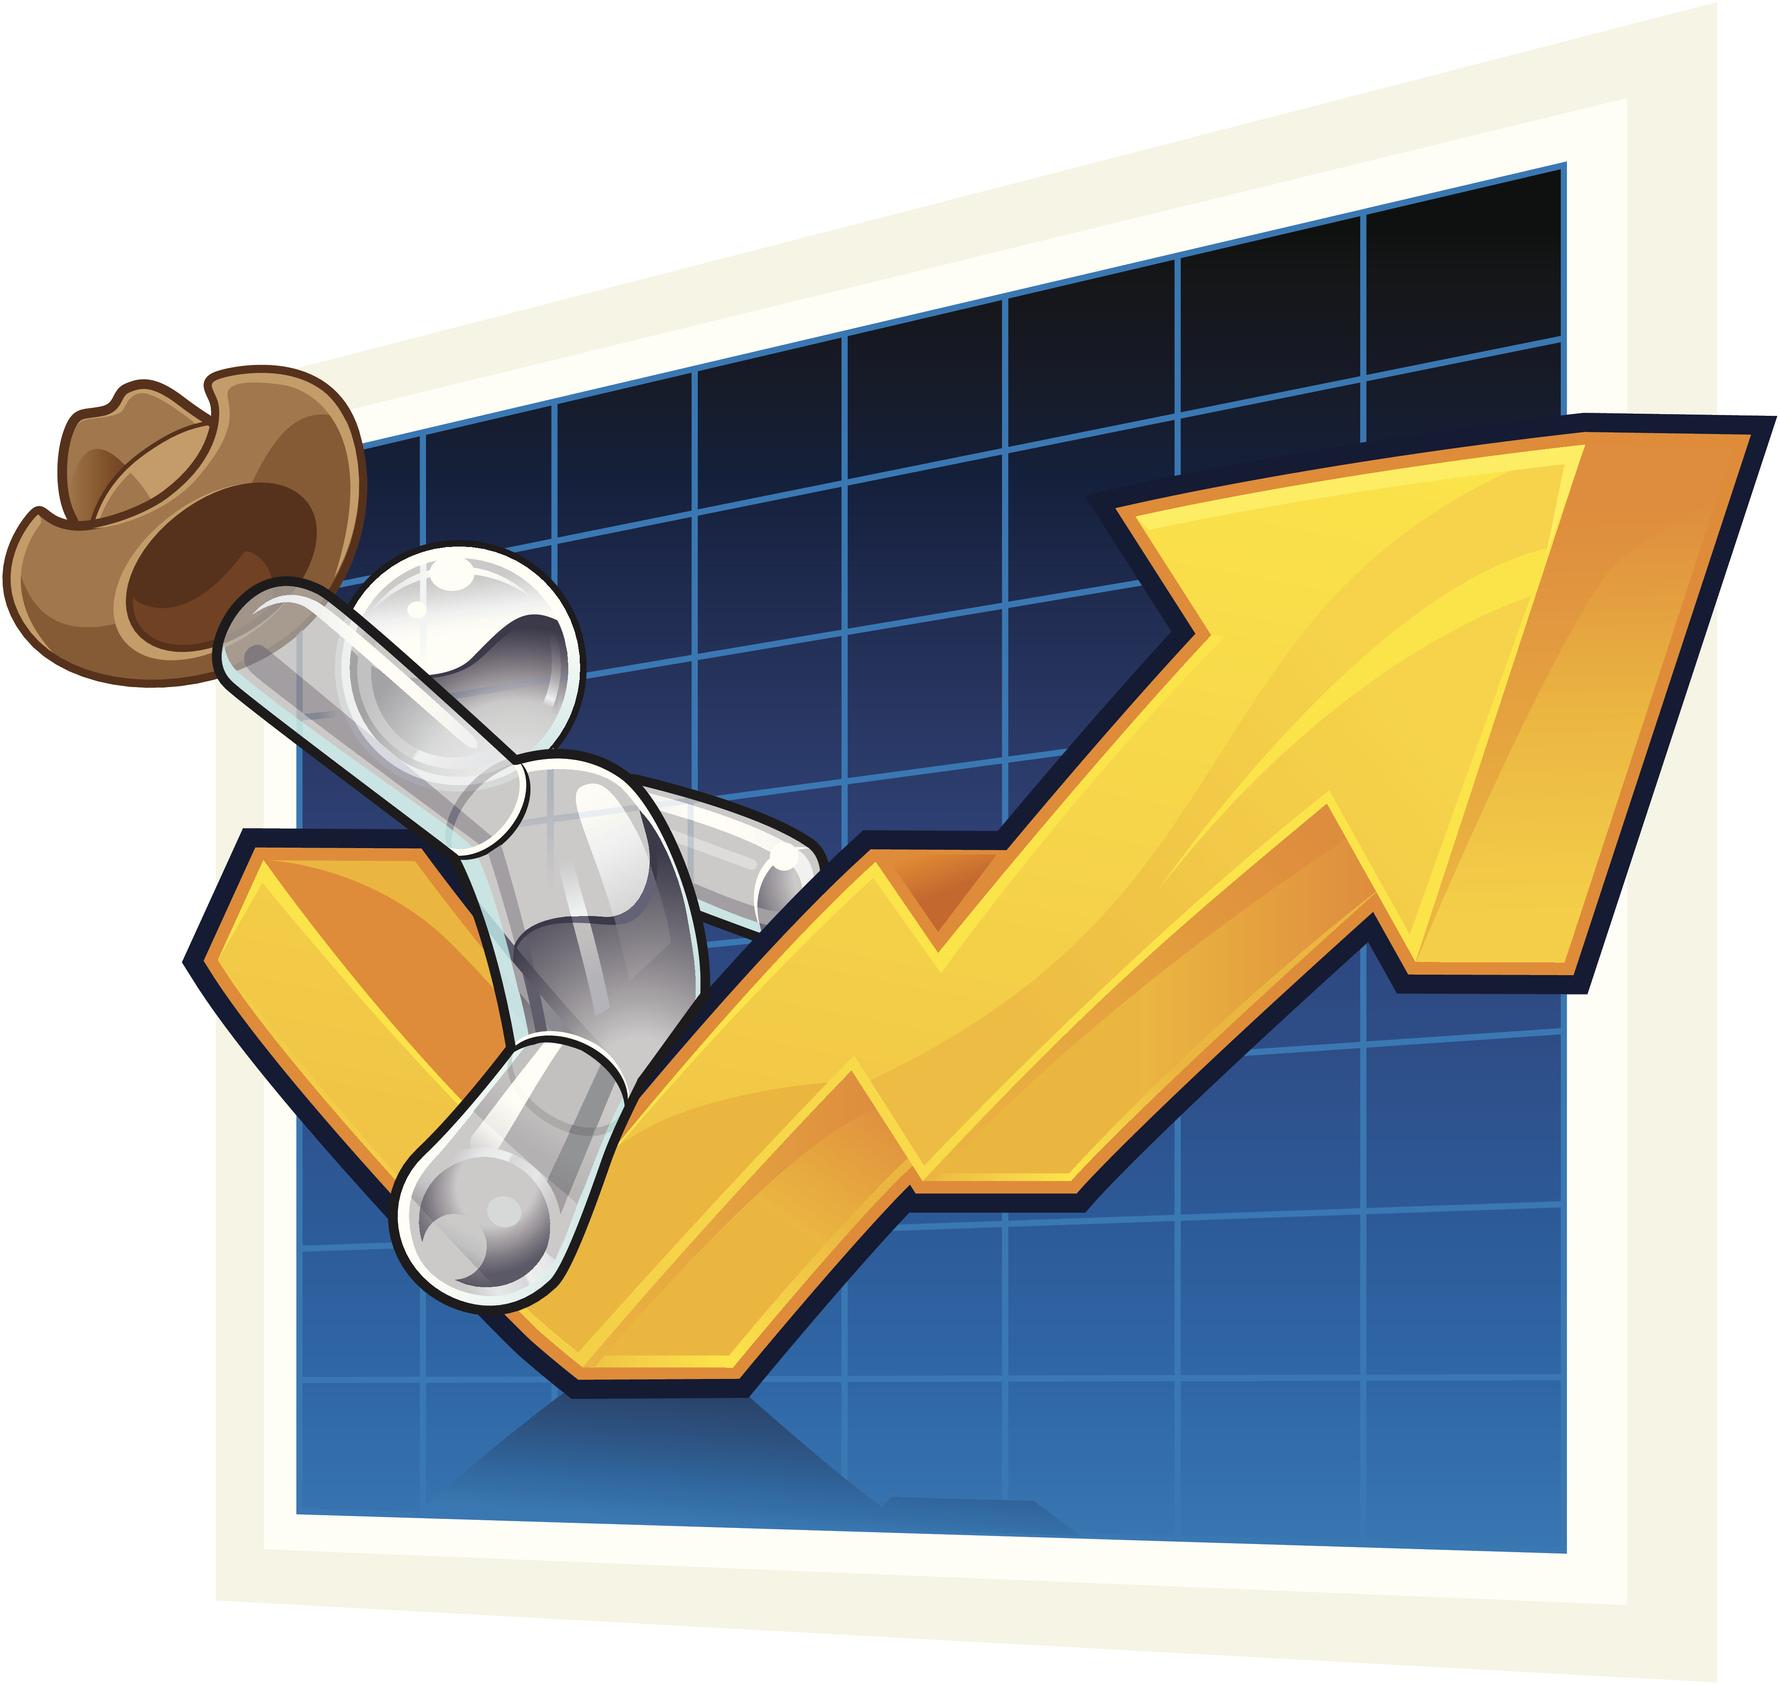 A cartoon cowboy riding a stock chart moving higher